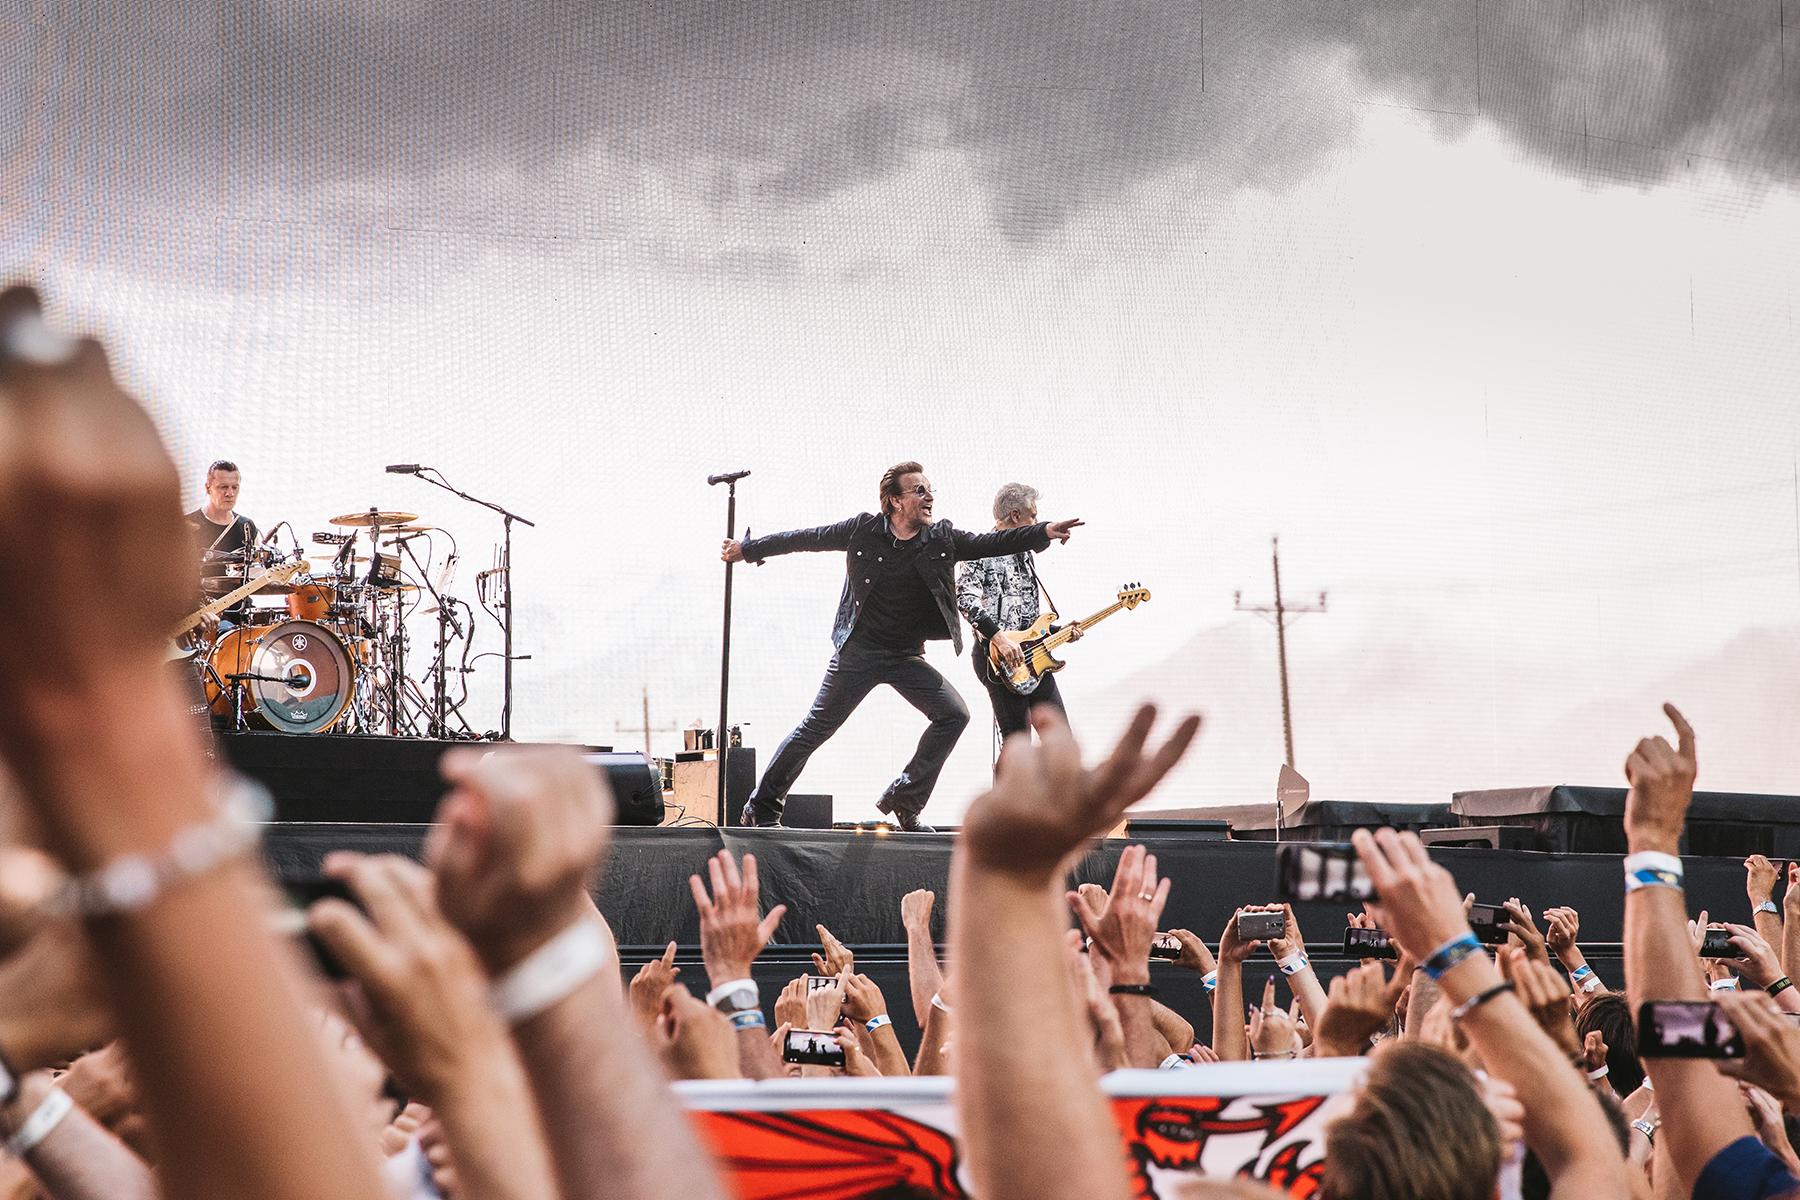 U2-TheJoshuaTreeTour-Twickenham08-5-CREDIT_DANNY_NORTH.jpg